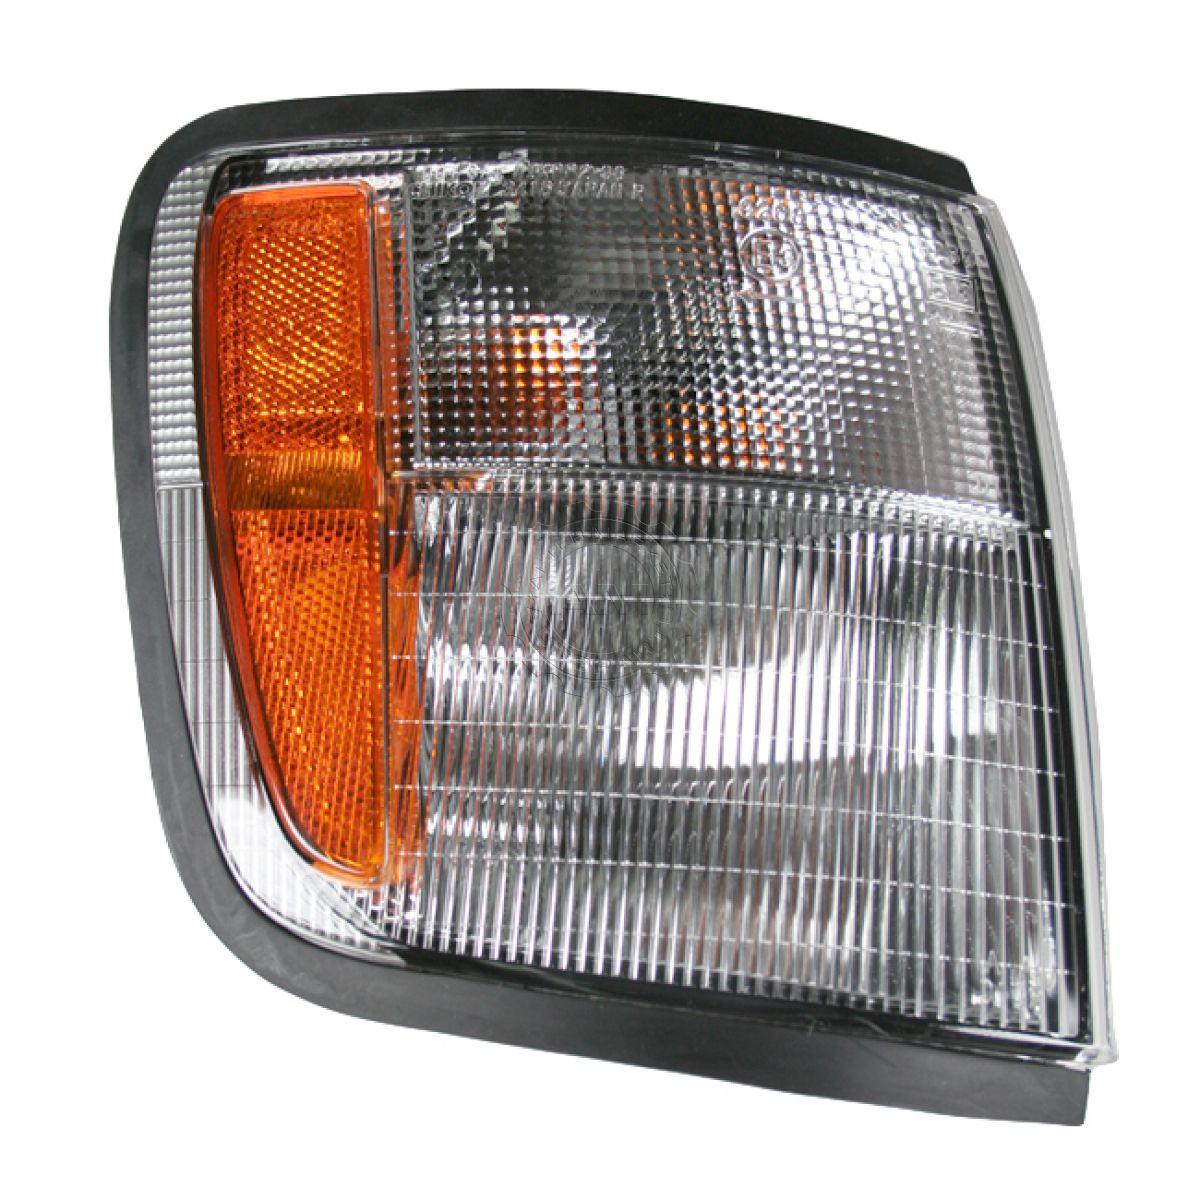 Signal Light RH Right for 98-99 Acura SLX 1998-2002 Isuzu Trooper